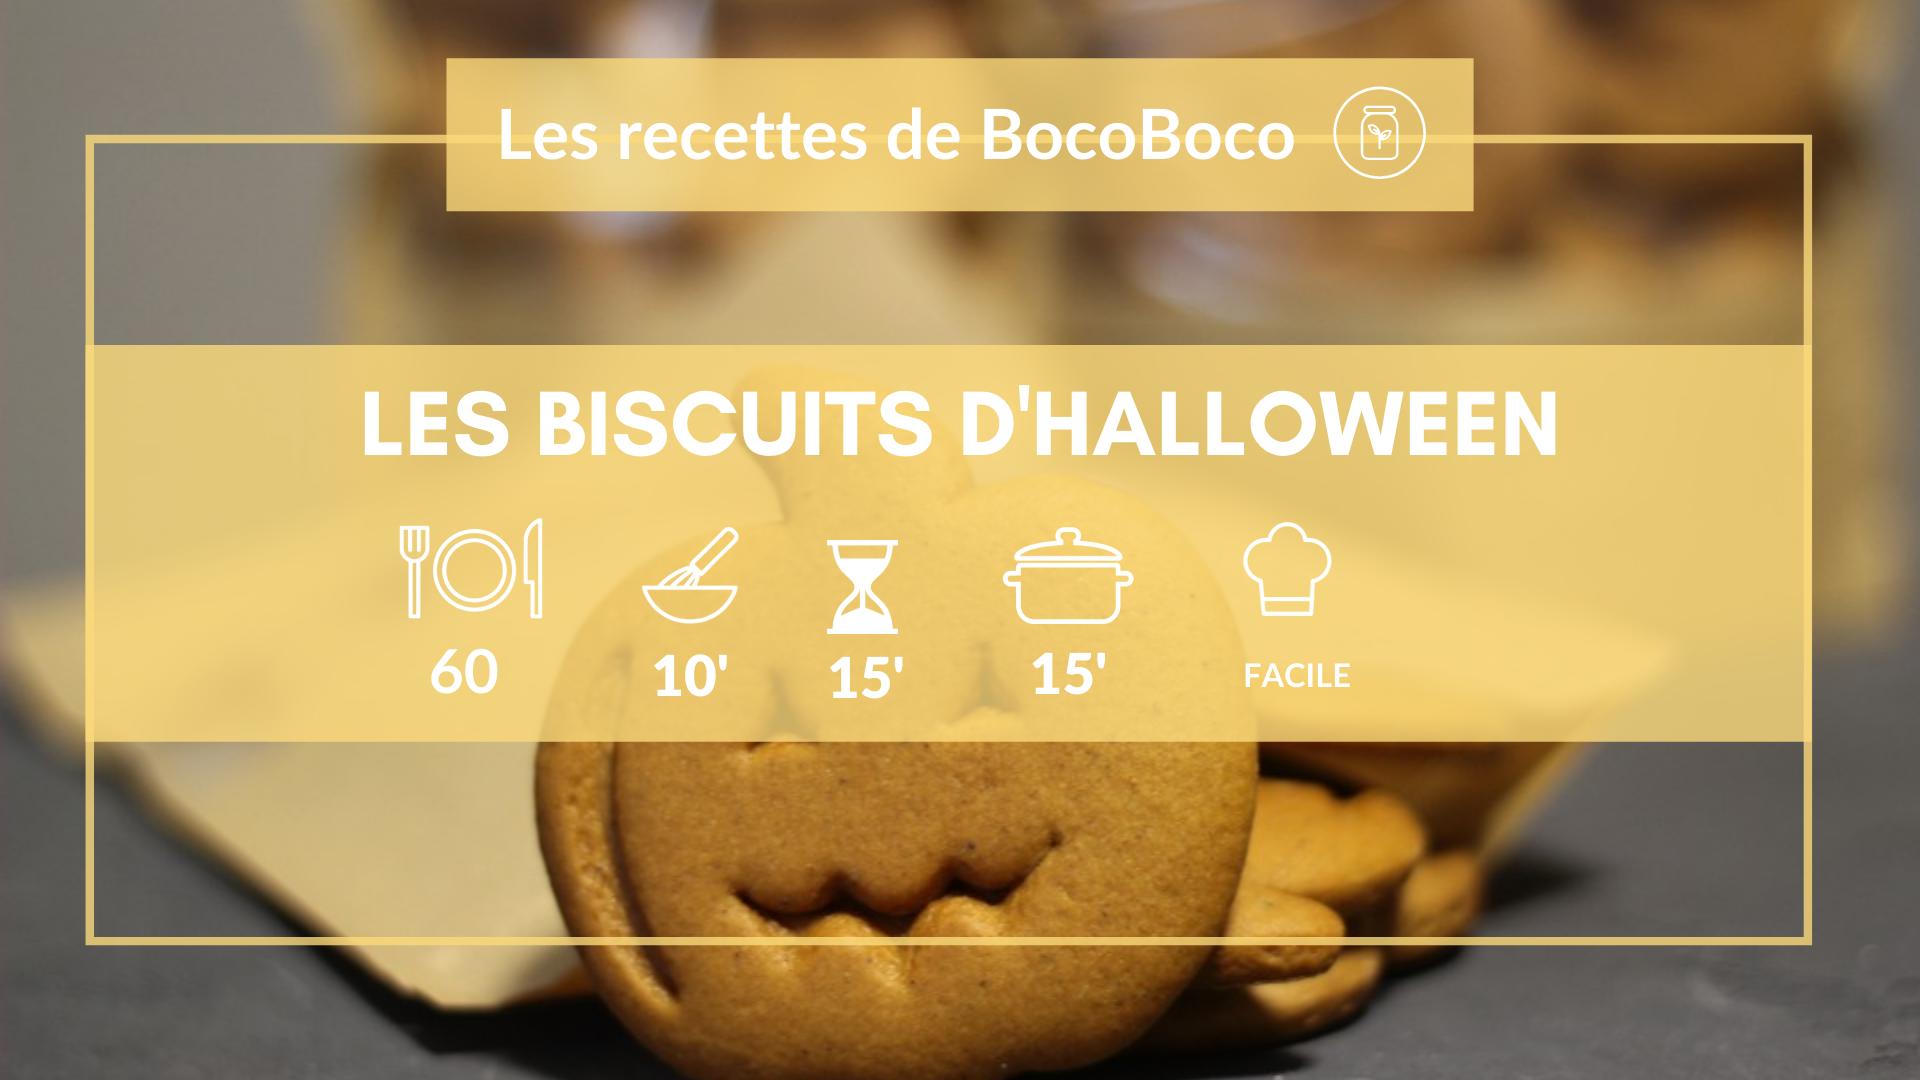 Recette des biscuits croquants d'Halloween